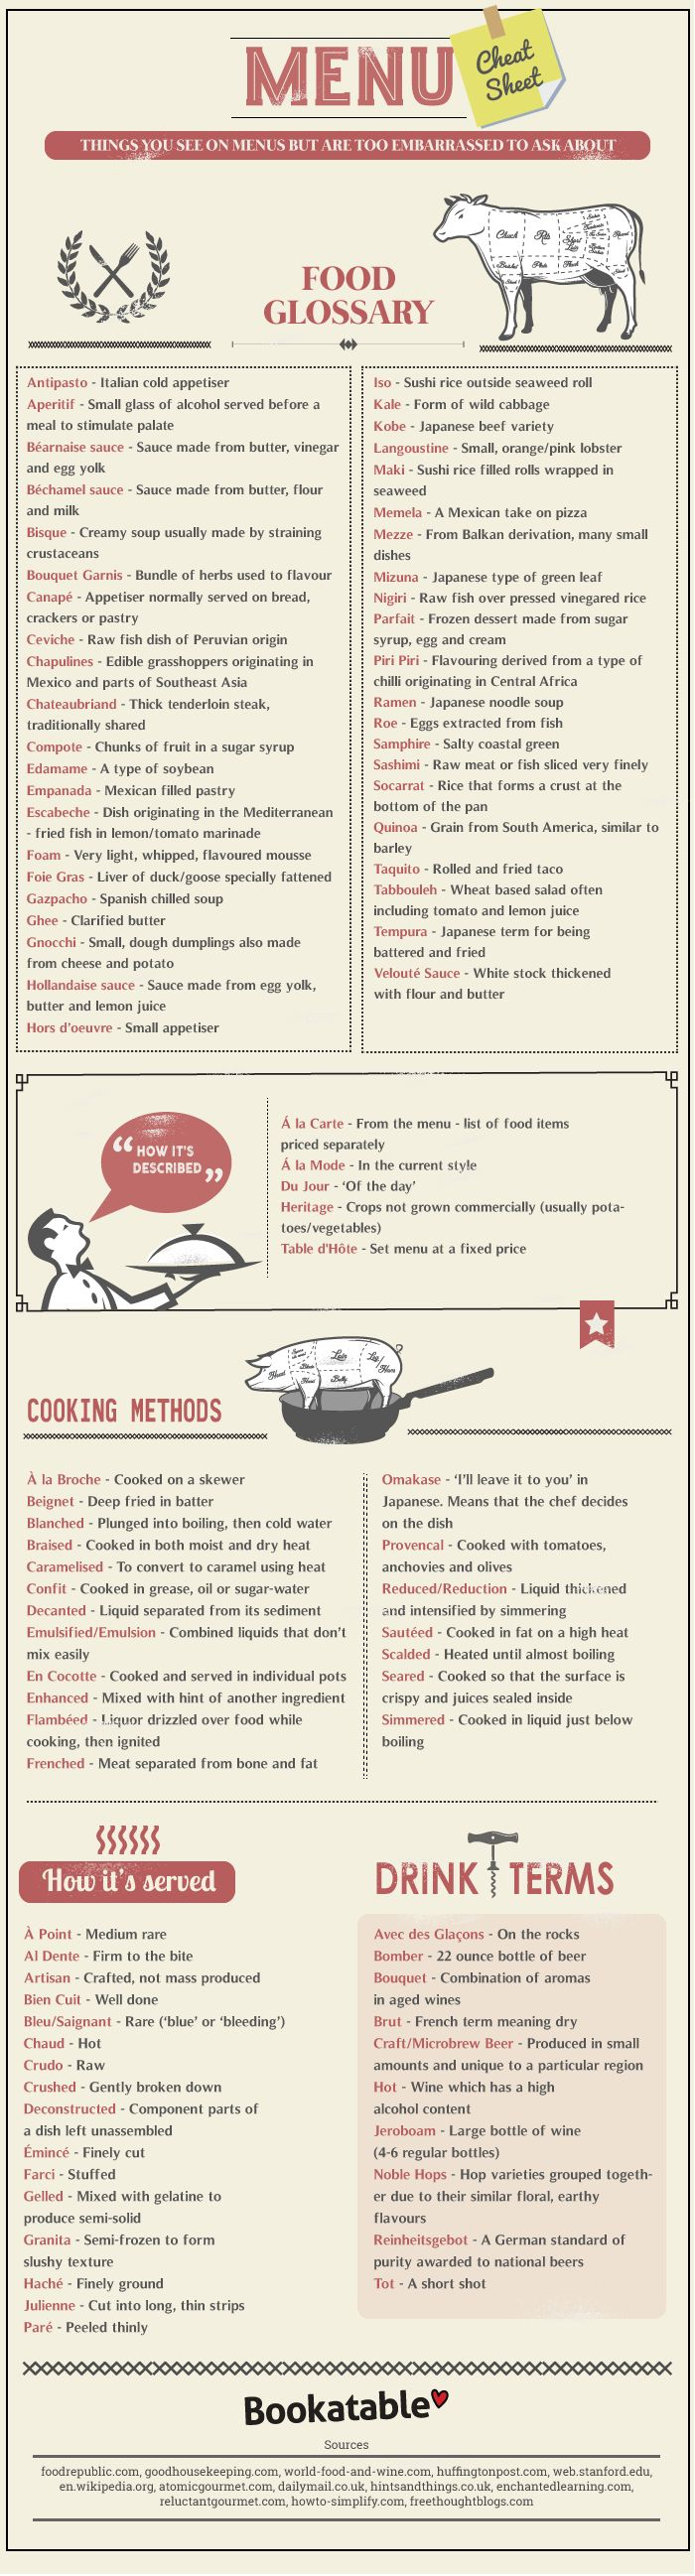 Menu Cheat Sheet #infographic #Food #Drinks